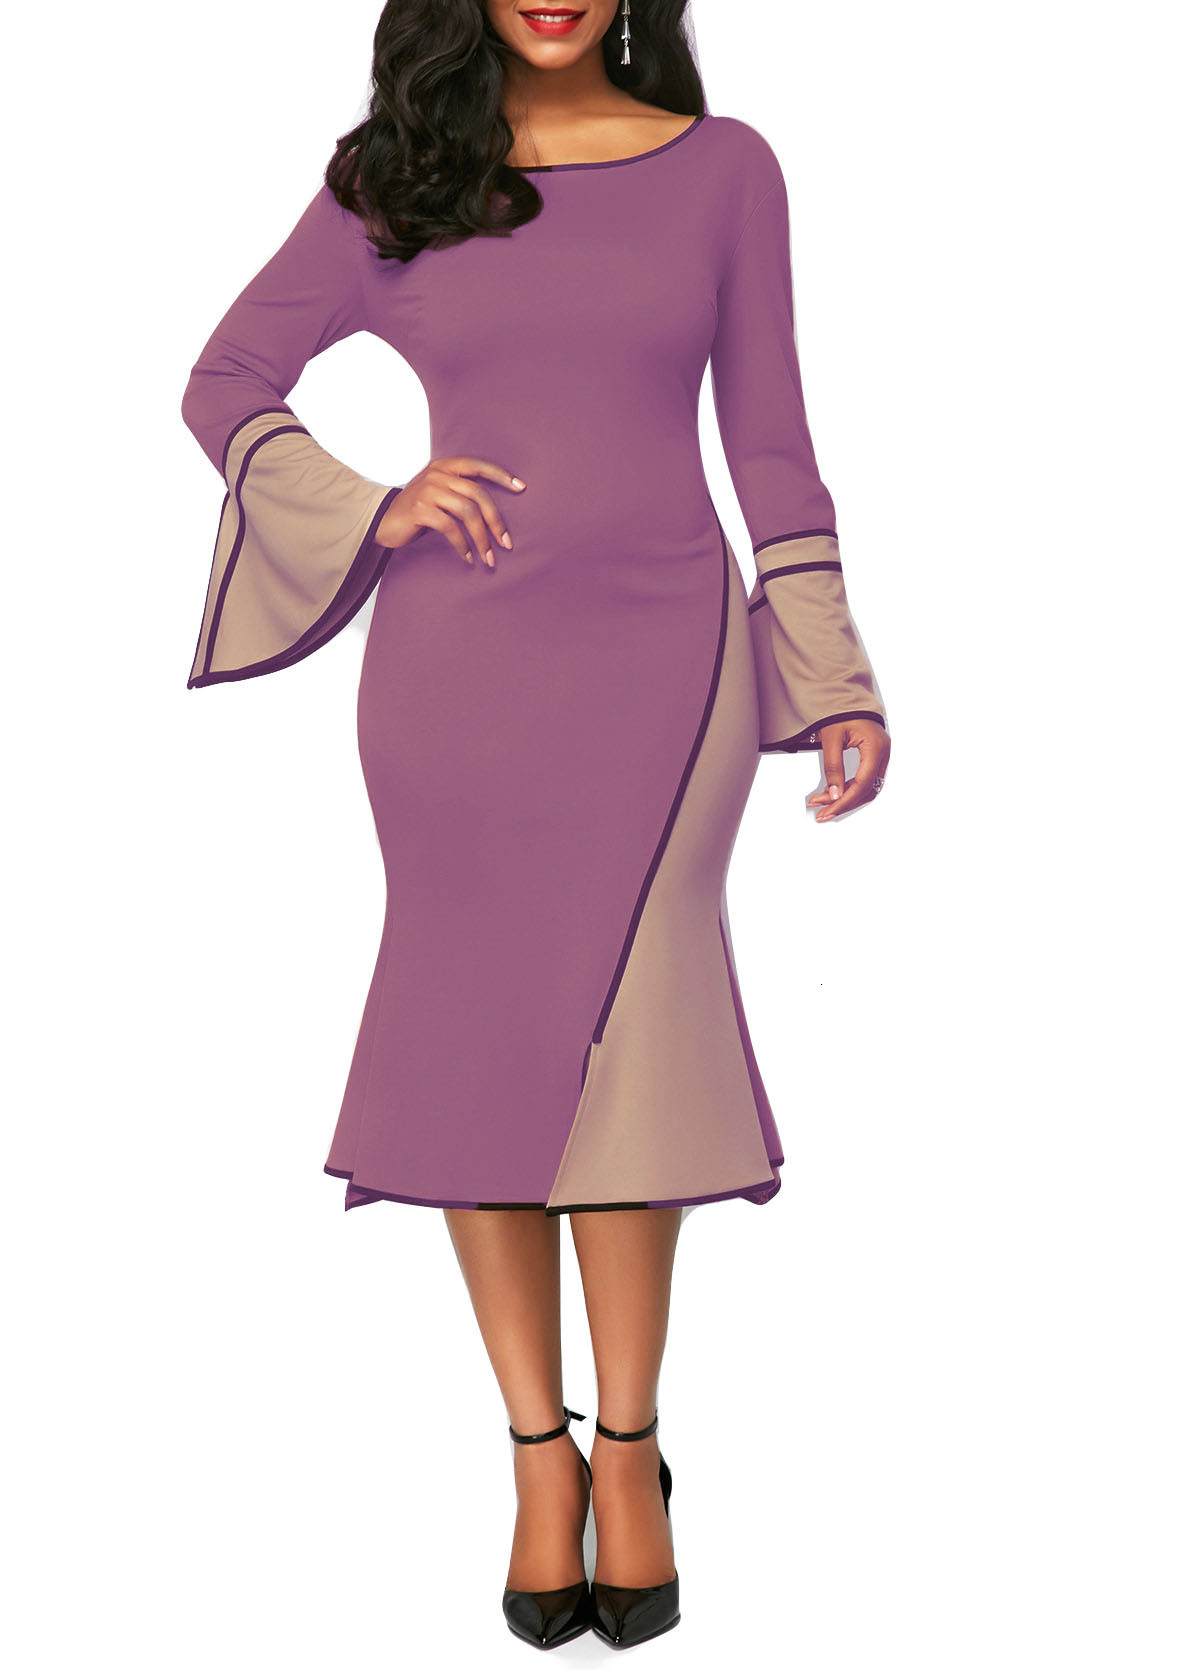 BacklakeGirls Elegant Contrast Color Round Neck Horn Long Sleeve Women Cocktail Dresses Plus Size Office Dress Sexy Formal Dress